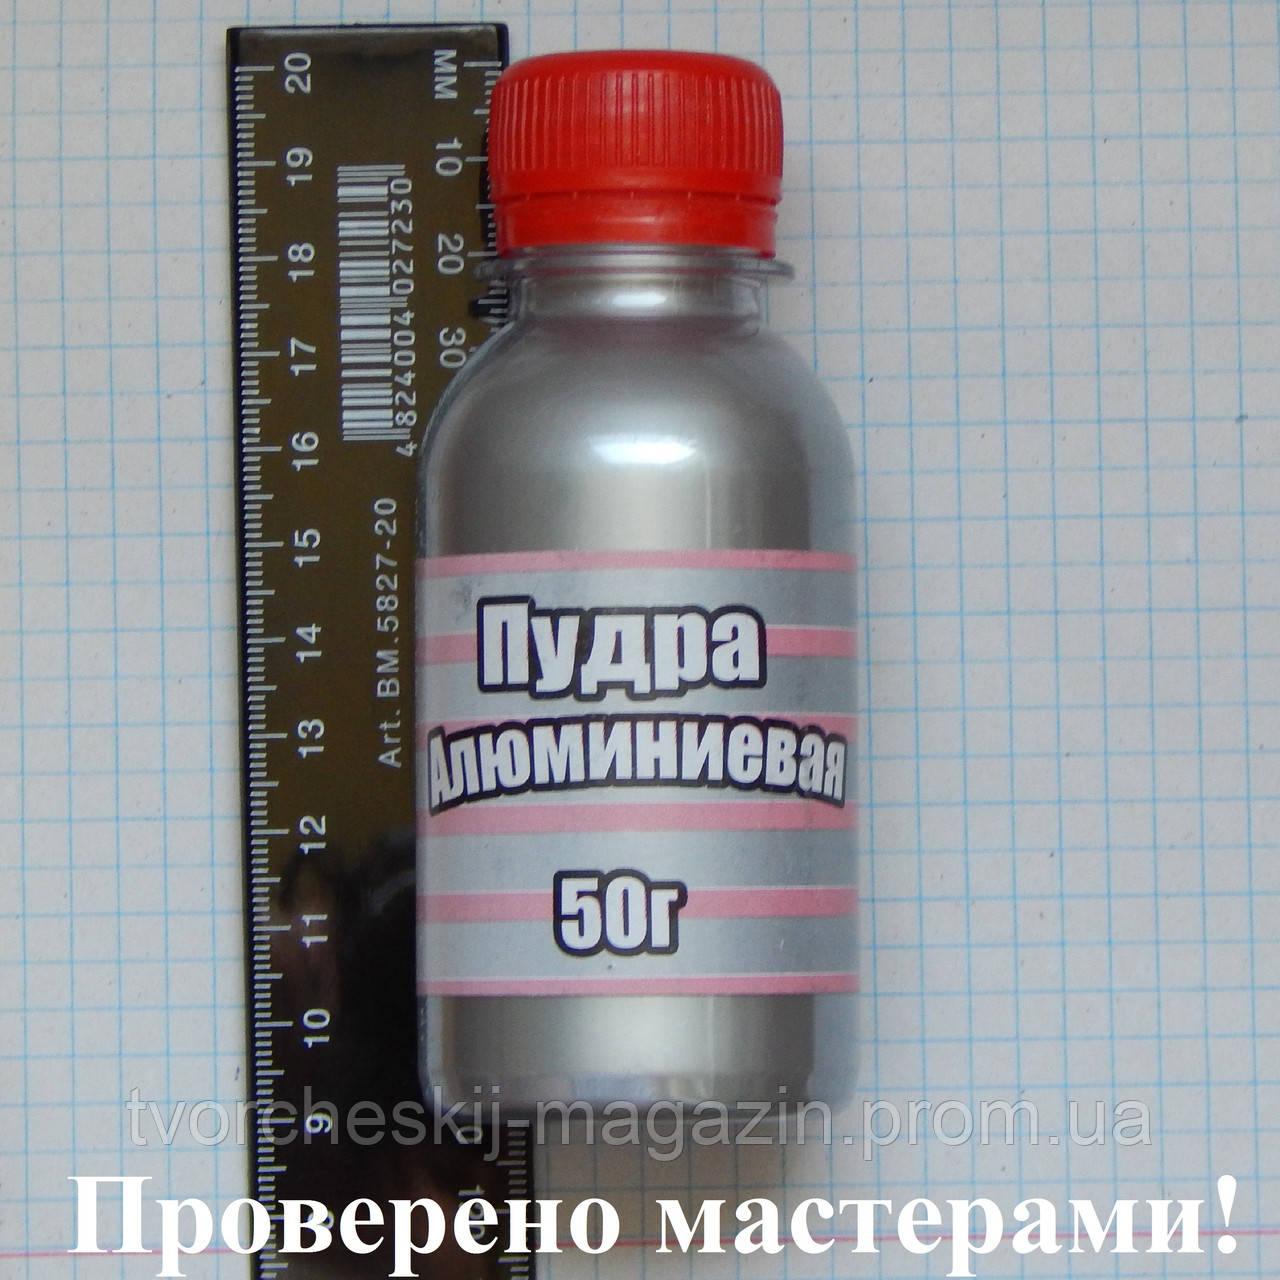 Пудра алюминиевая (серебрянка) 50 г